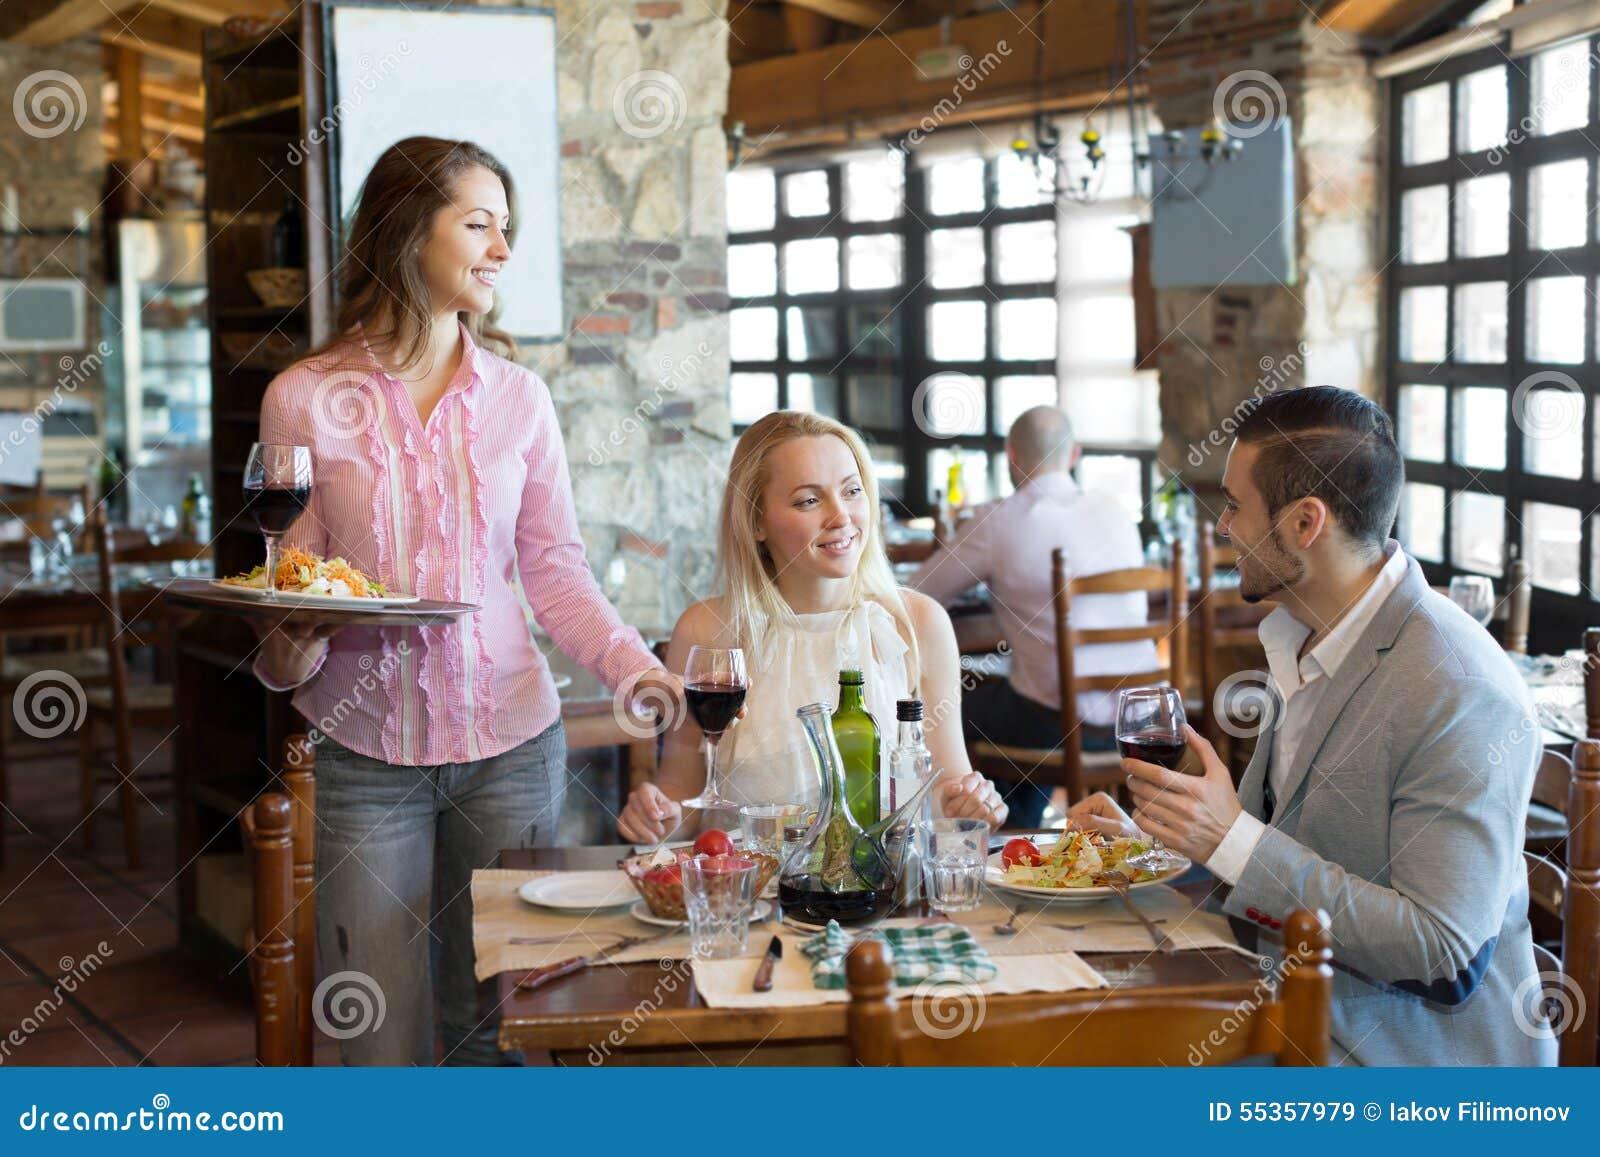 La gente cenando ristorante rurale